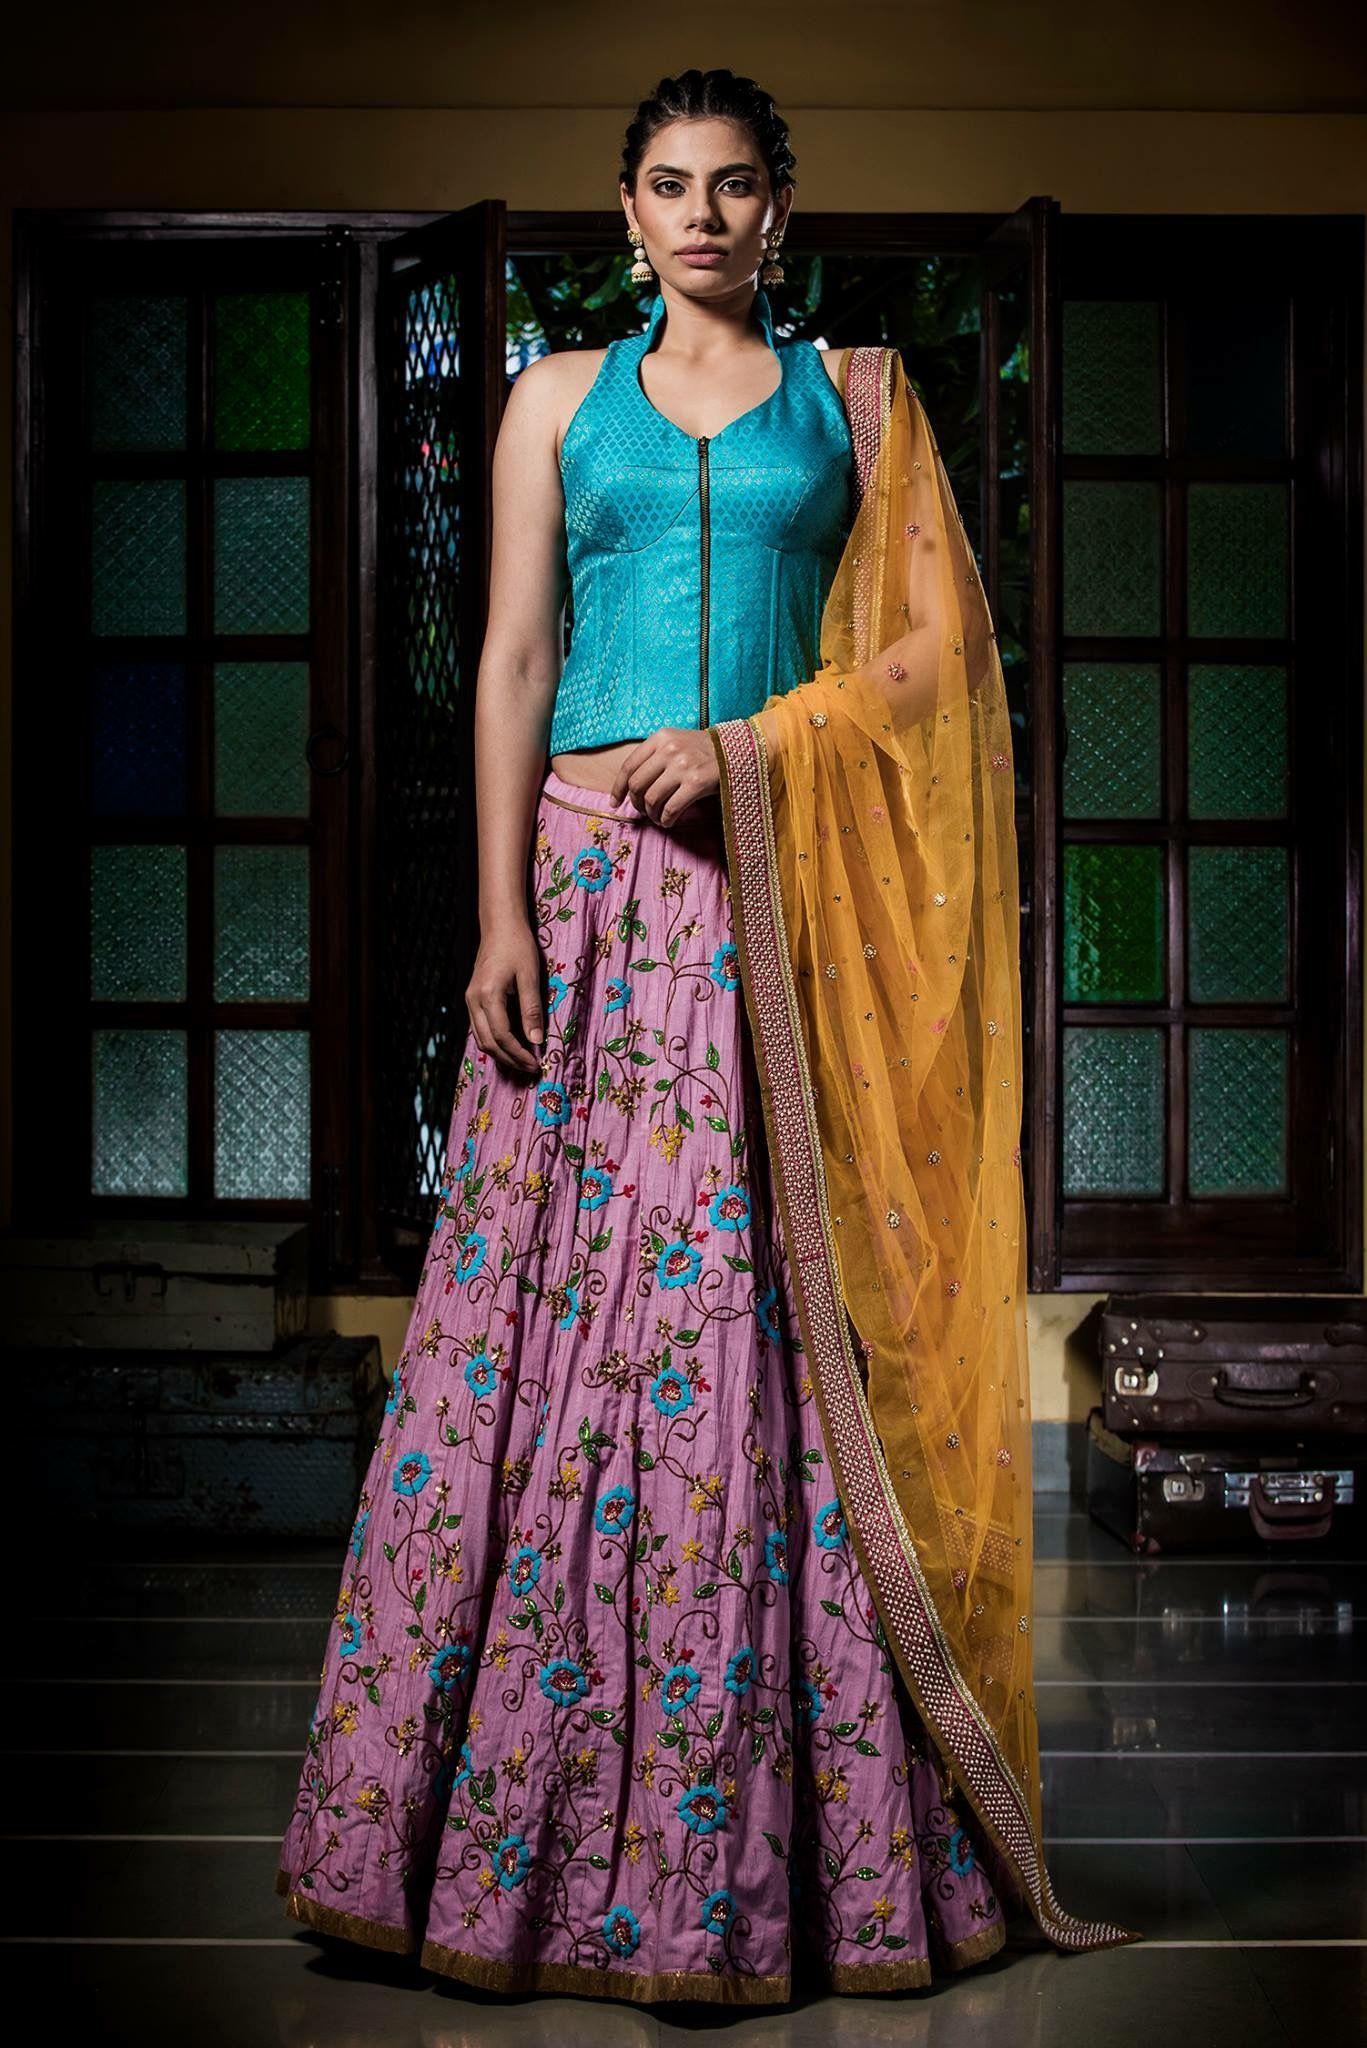 Pin by Spandana Reddy Sappidi on Dresses,sarees,lehangas | Pinterest ...